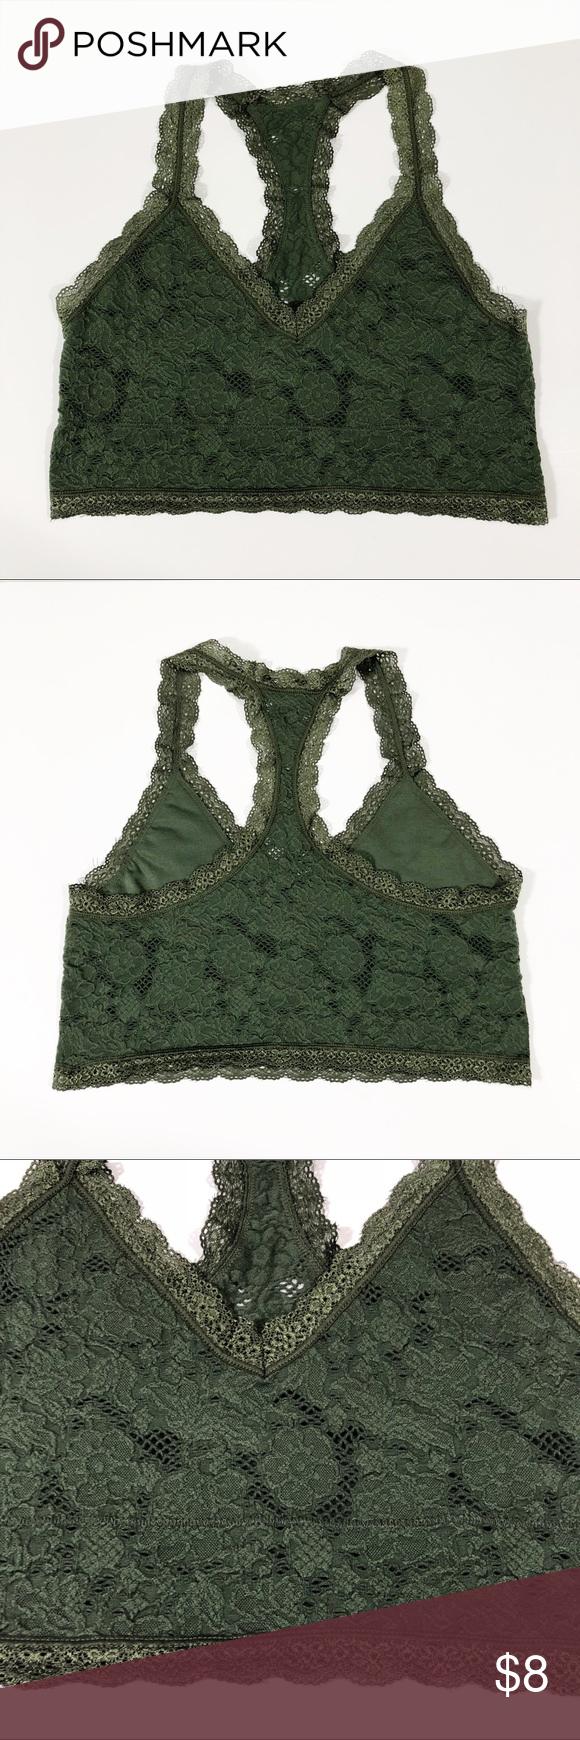 af0d43569b2 CC Olive Green Lainie Bralette Charming Charlie Lainie Bralette Details  Olive  green lace bralette with